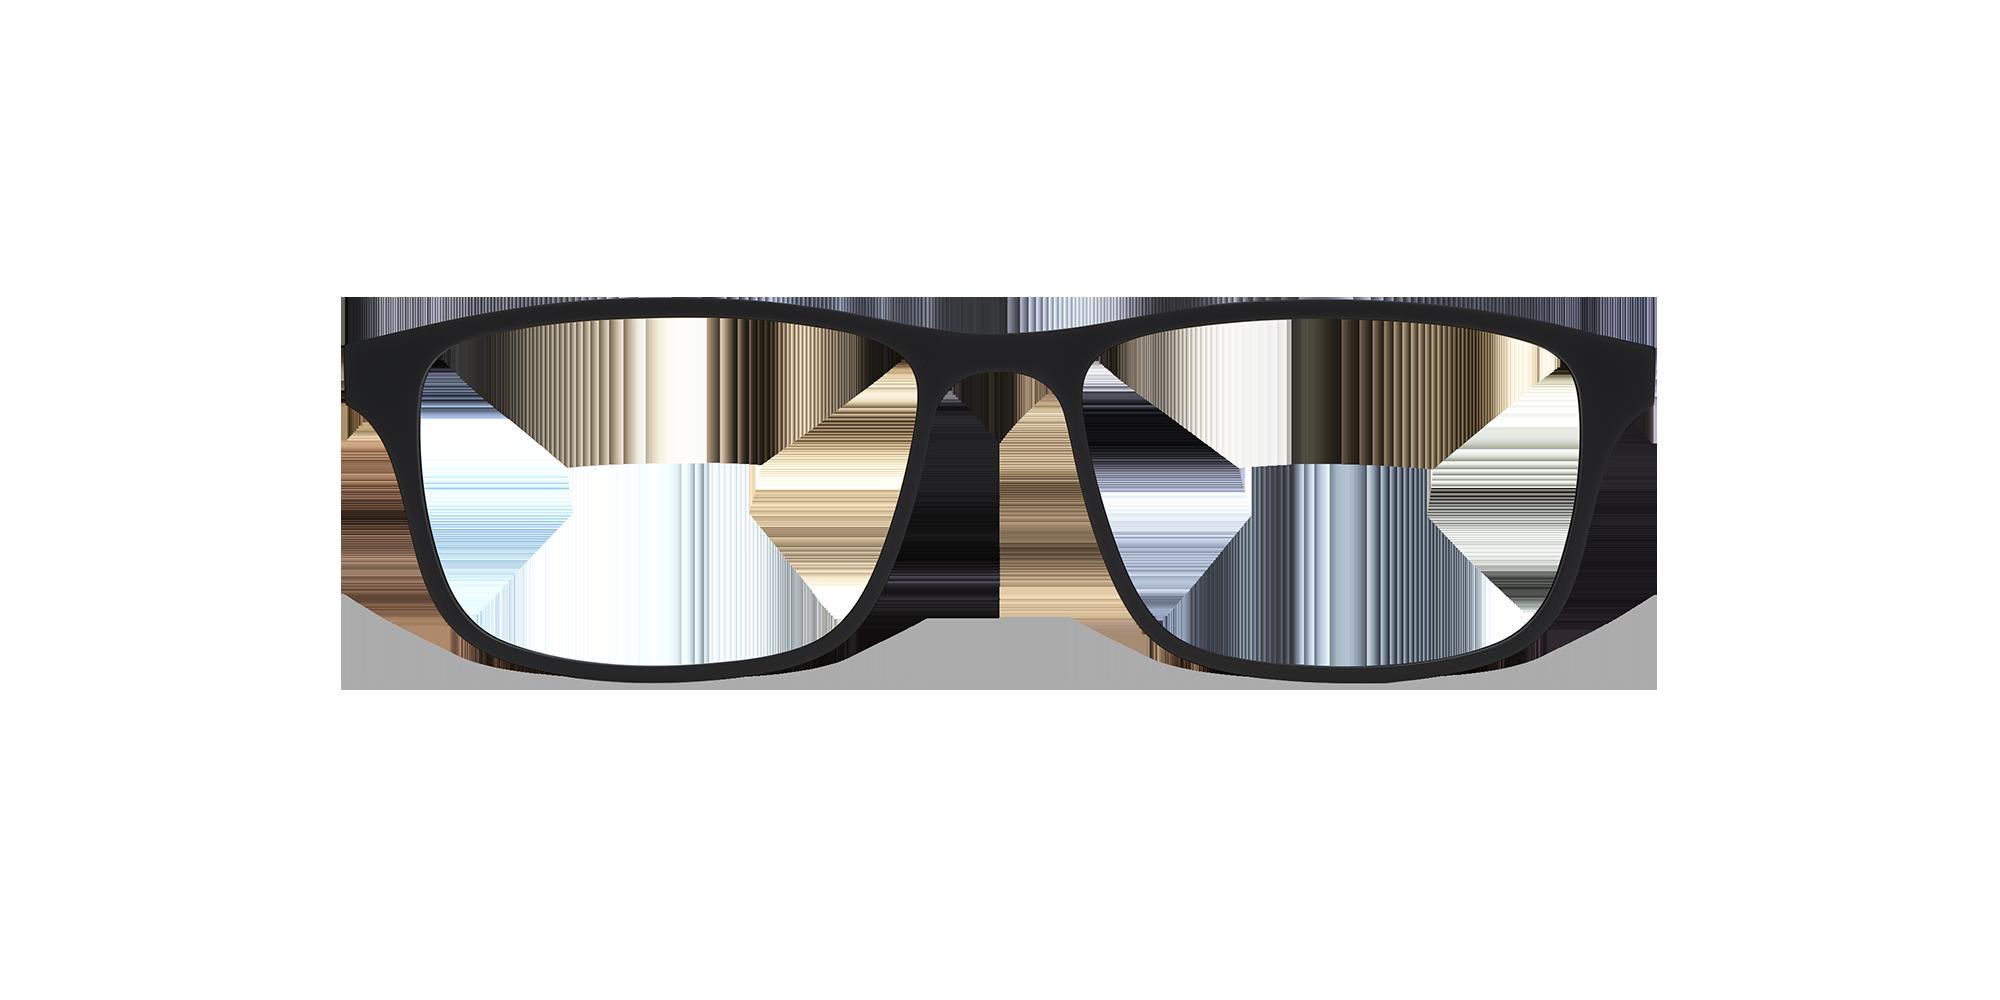 afflelou/france/products/smart_clip/clips_glasses/TMK41BBBK015416.png